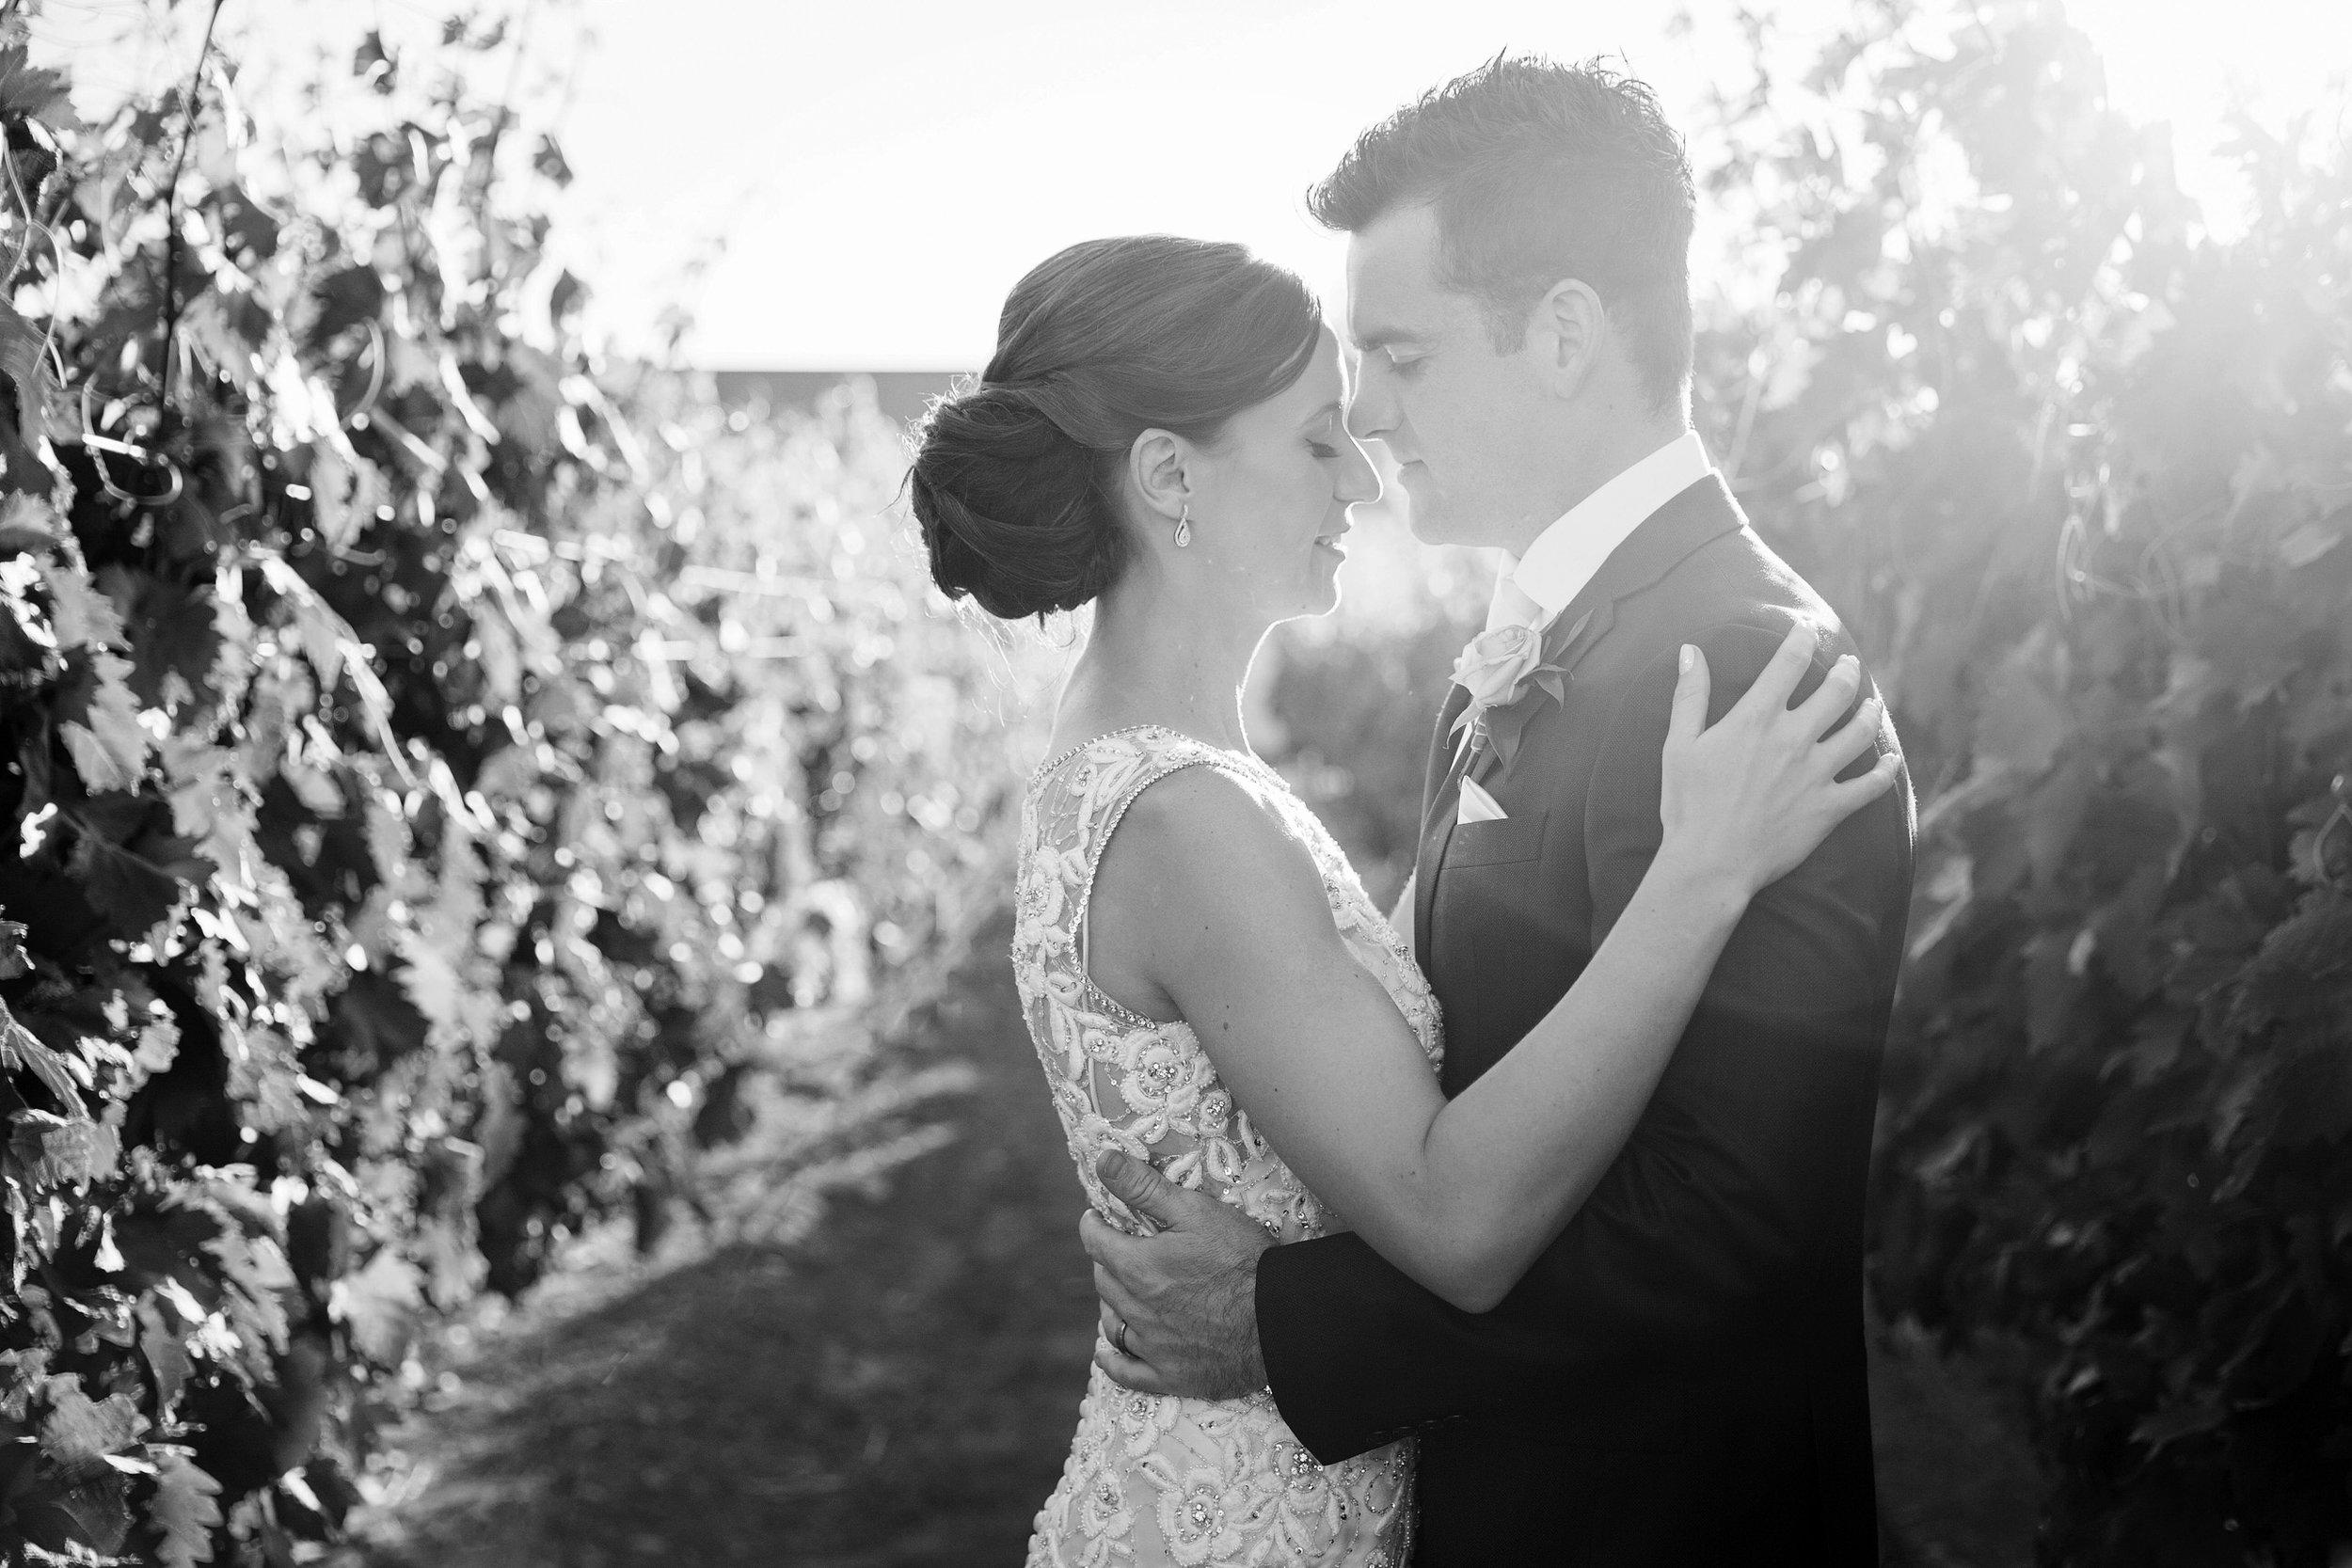 Martinborough-Poppies-Wedding-Caine-Eloise-Toni-Larsen-0111.jpg